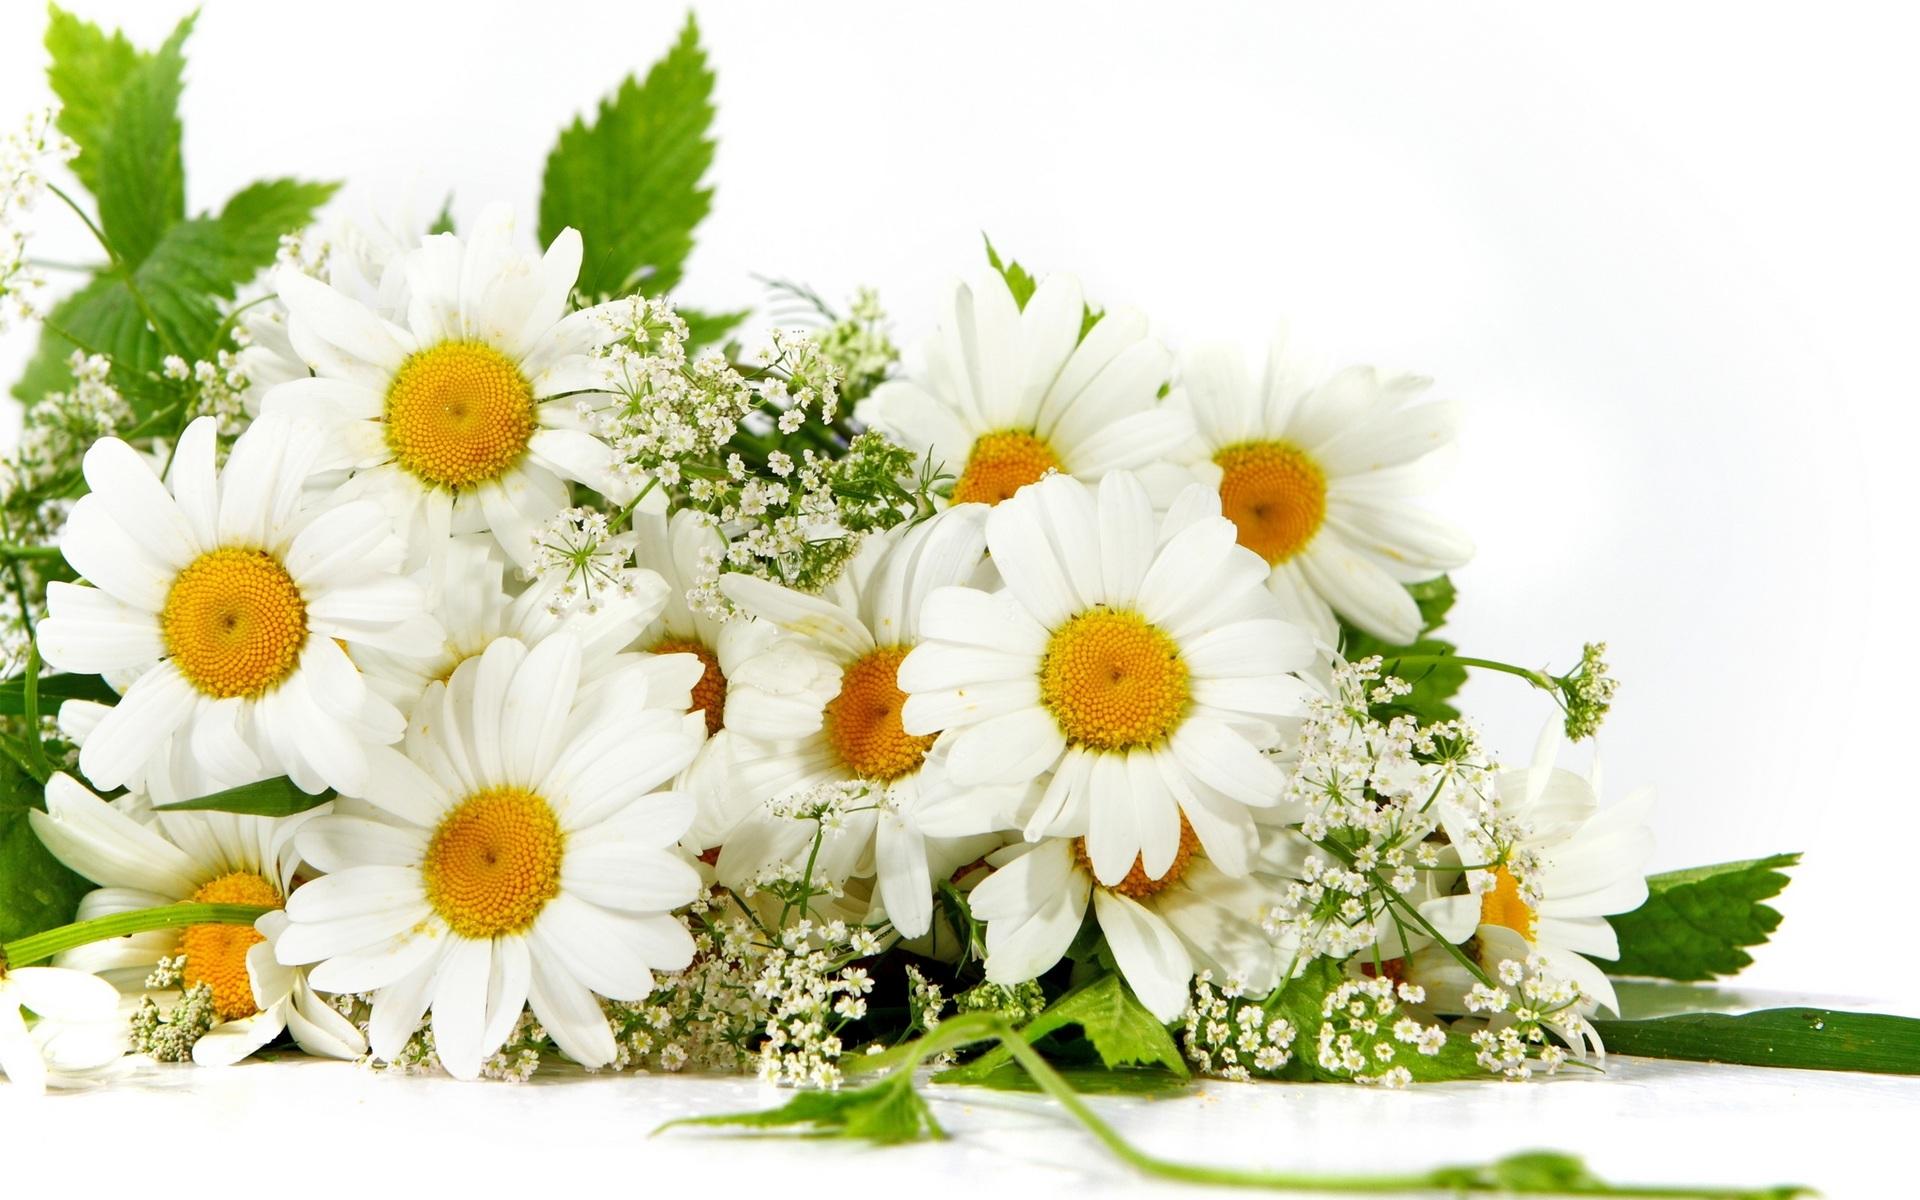 http://img.desktopwallpapers.ru/flowers/pics/wide/1920x1200/3dffbf35e03e015cb7dd681041db8760.jpg